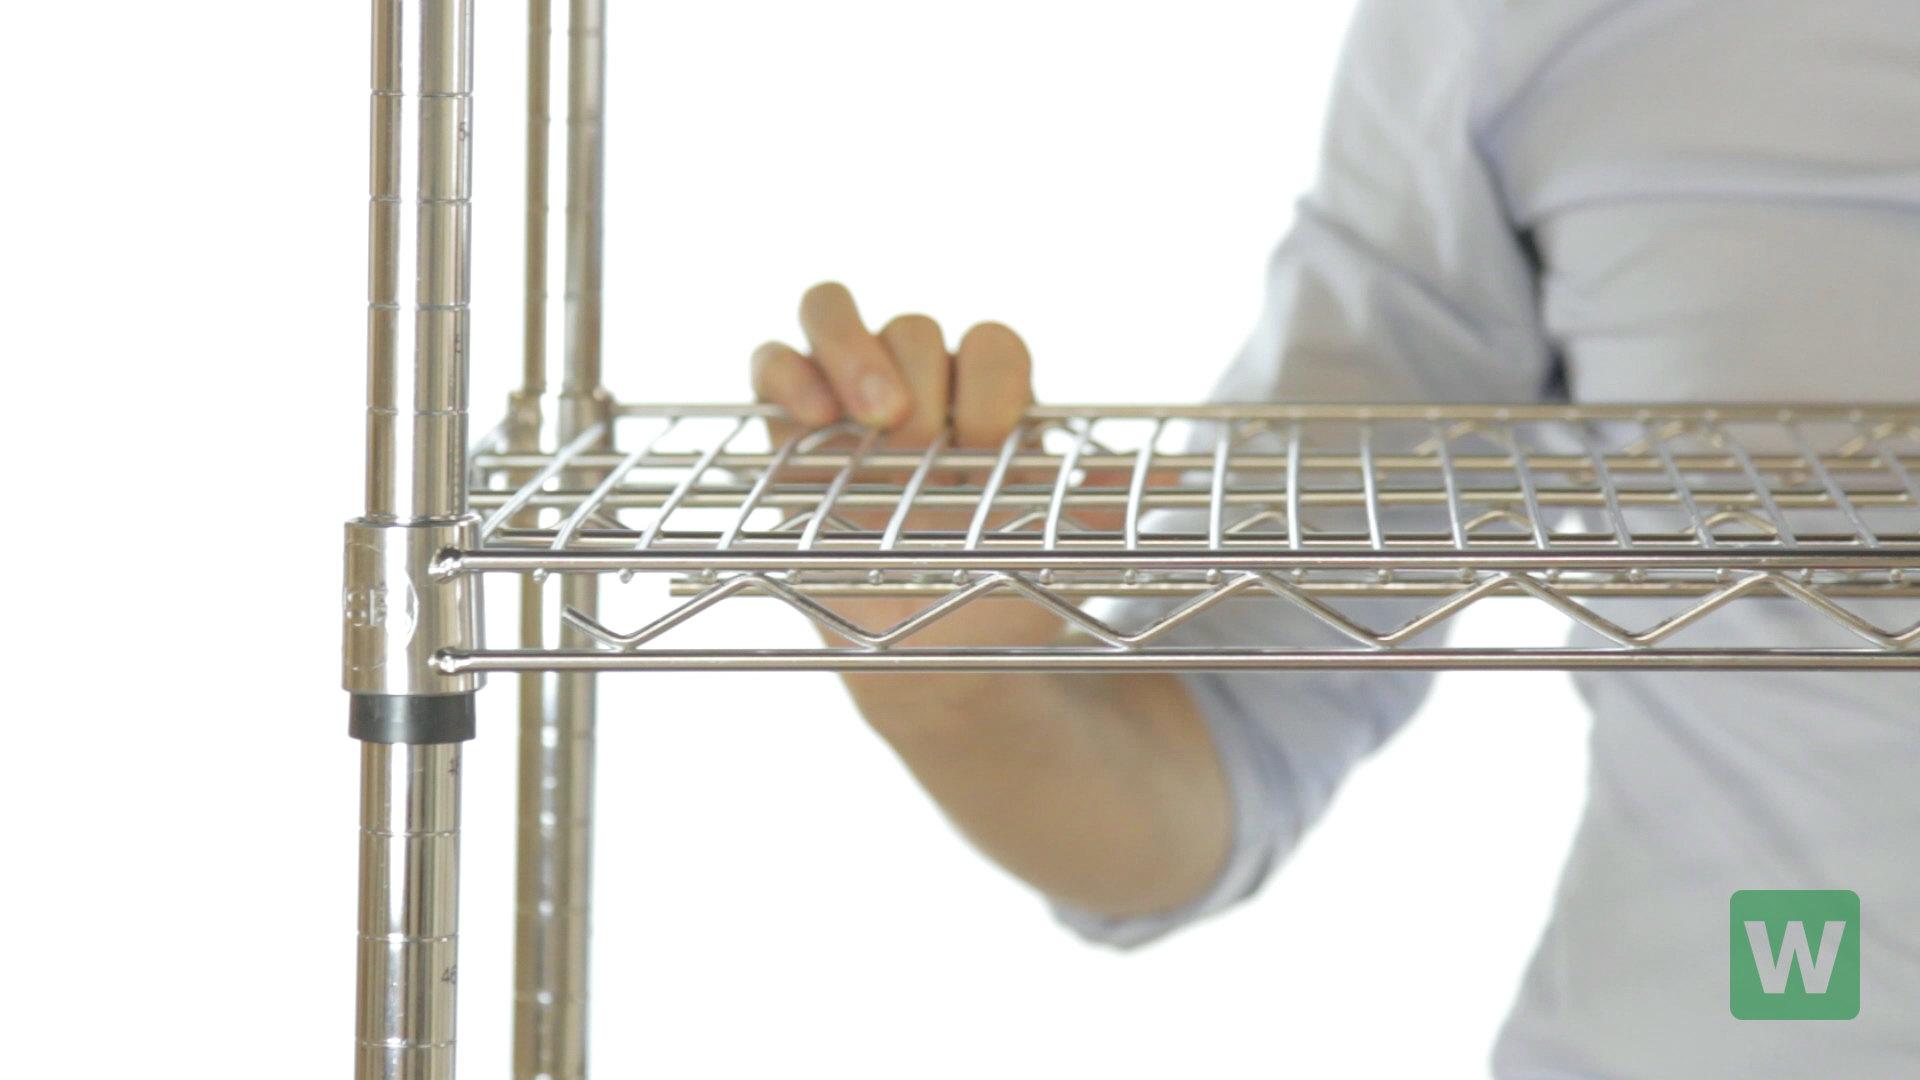 How to Assemble Regency Wire Shelving - WebstaurantStore TV Video